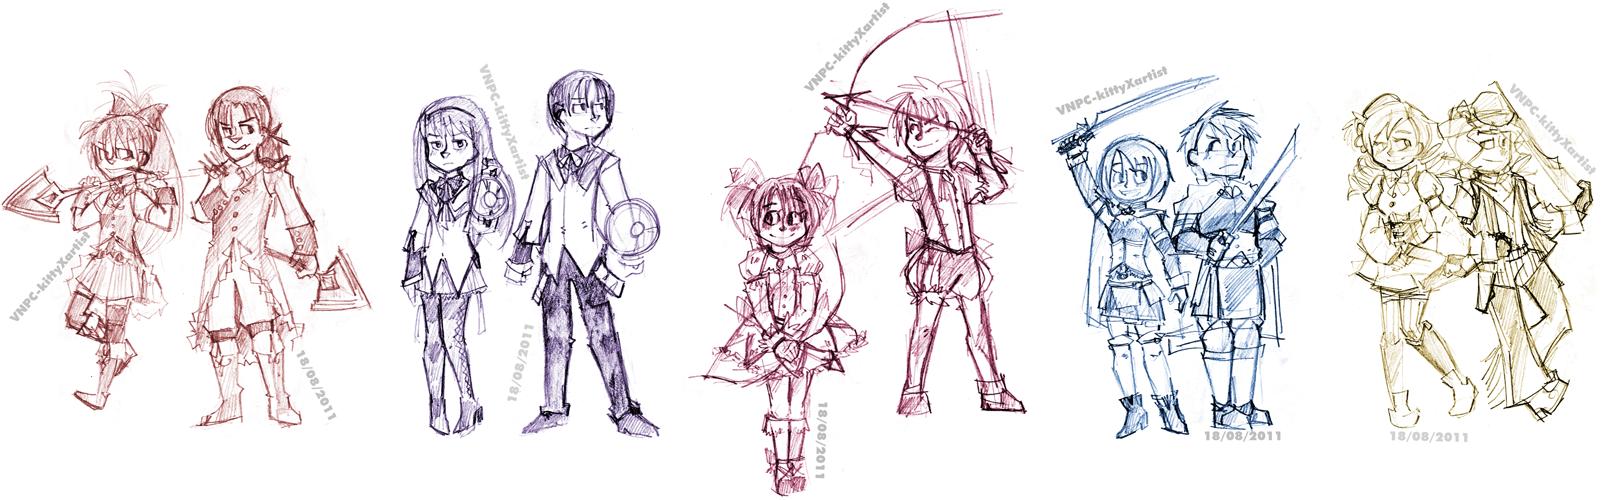 how to draw shonen anime